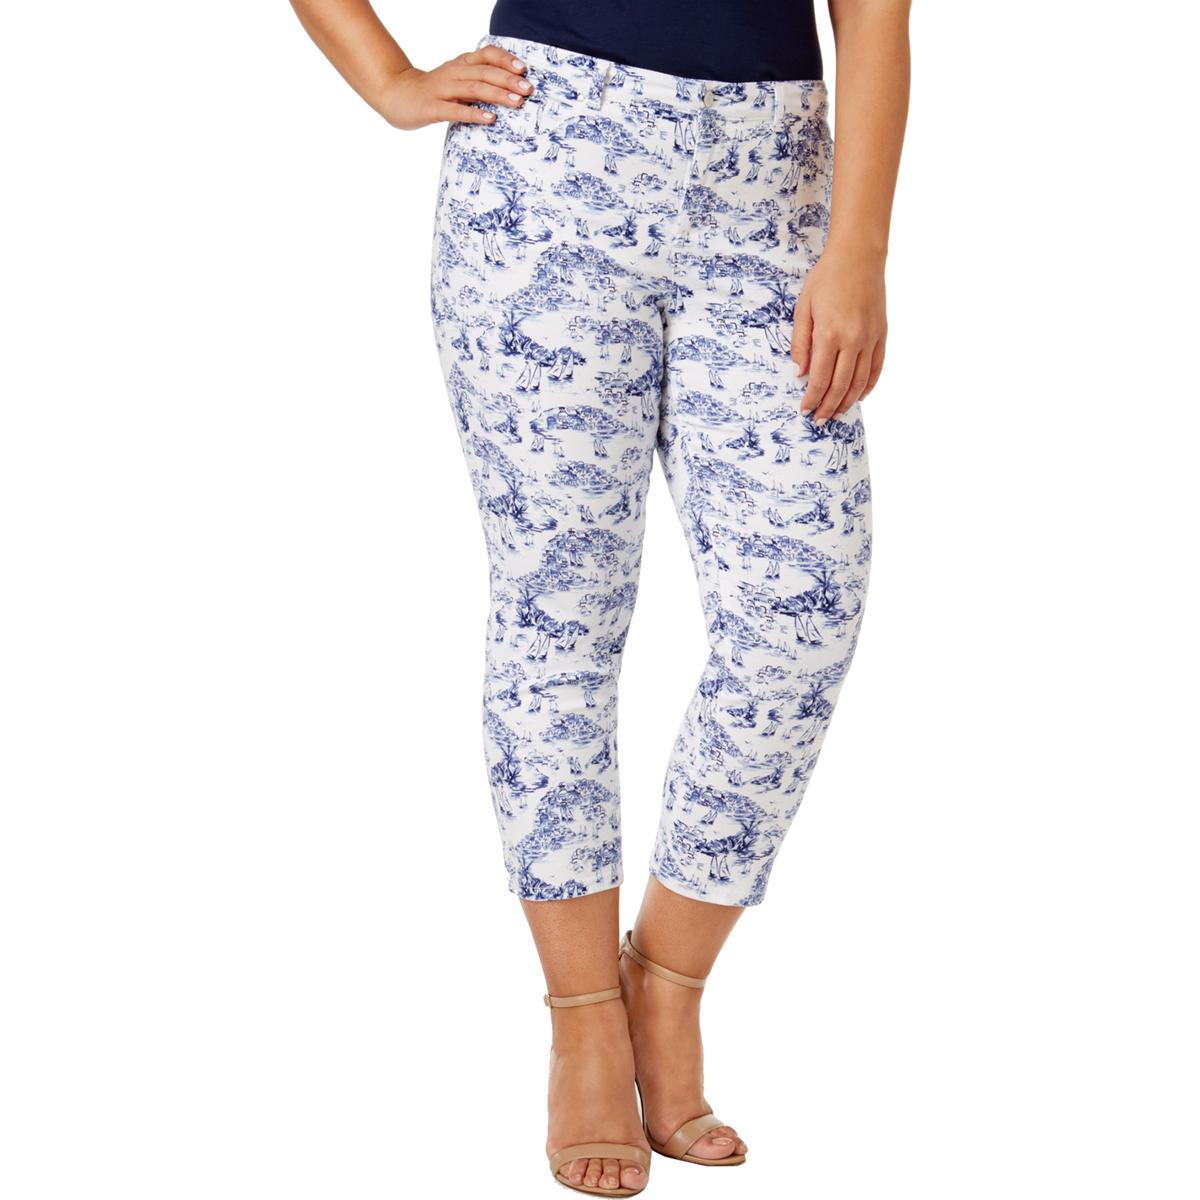 f3e2e8775f6 Details about Charter Club Womens Bristol Blue Printed Casual Capri Pants  Plus 16W BHFO 3721